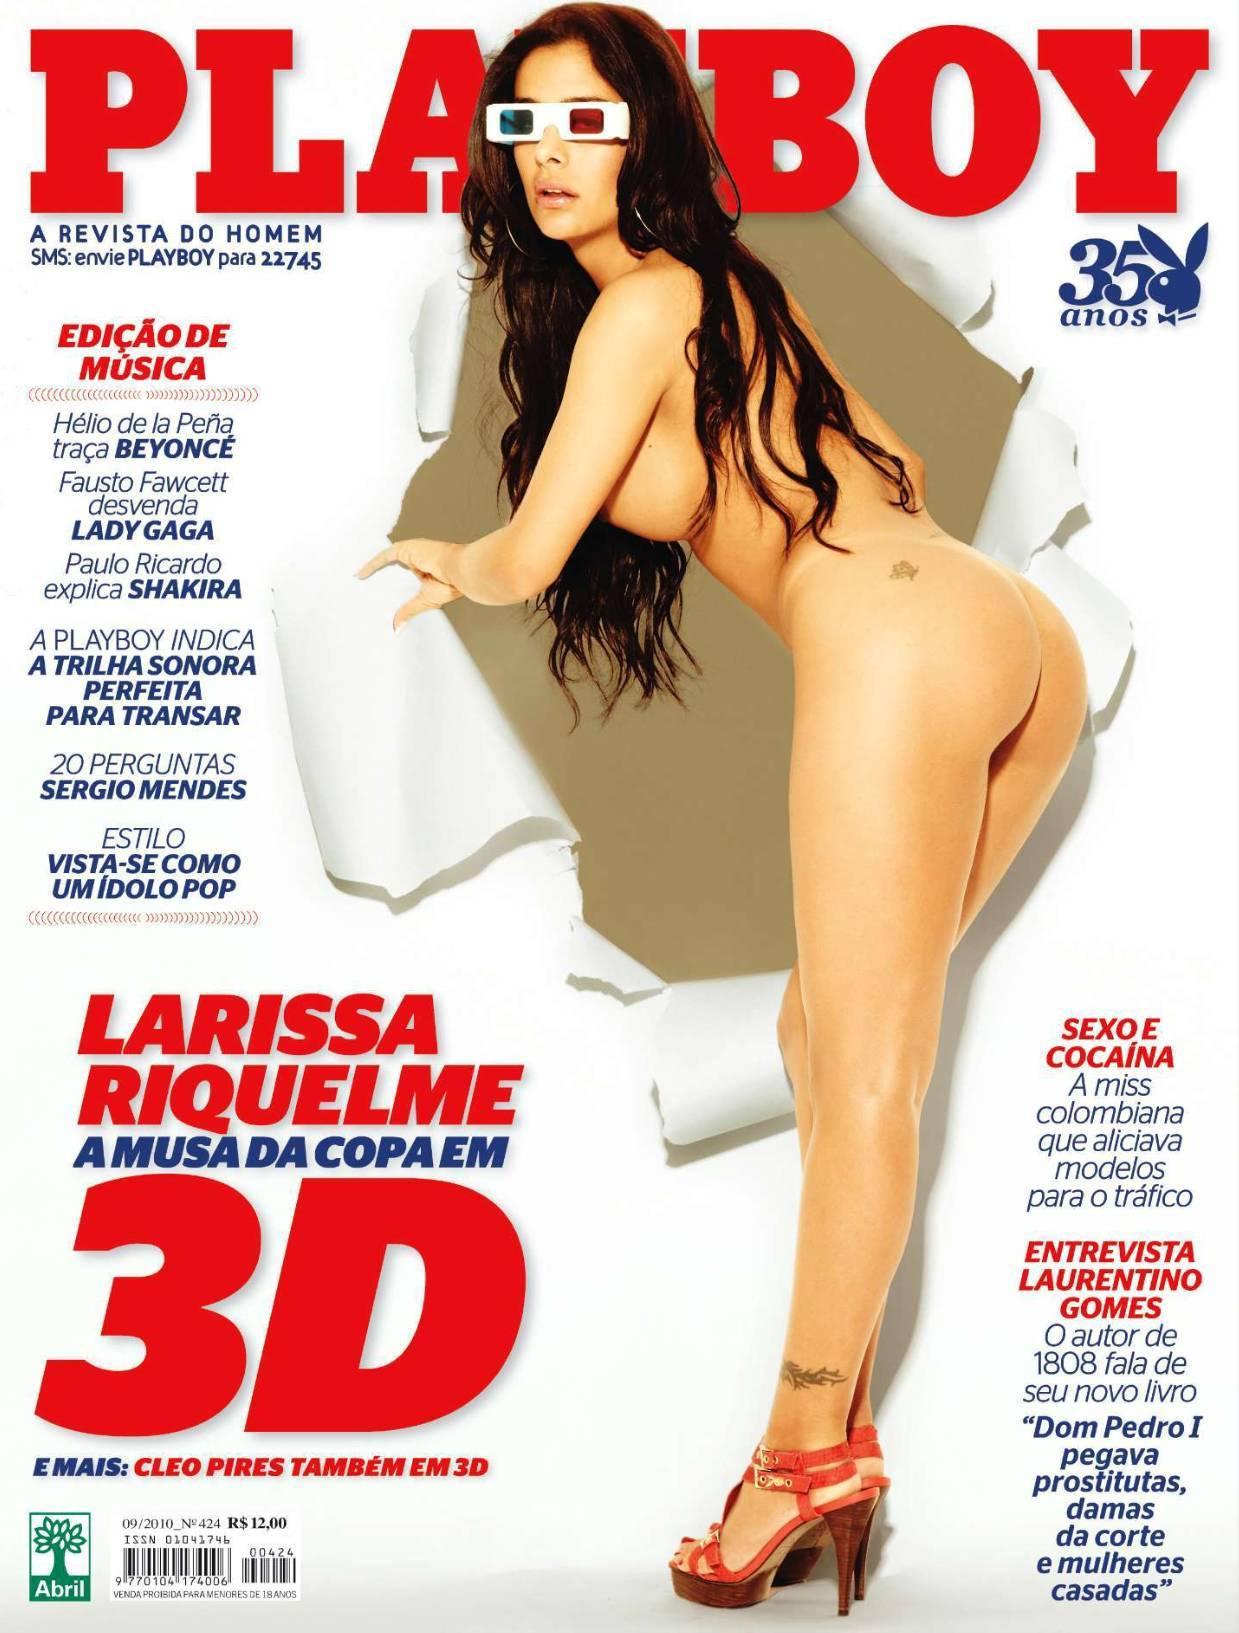 Larissa Riquelme en Playboy (2010)